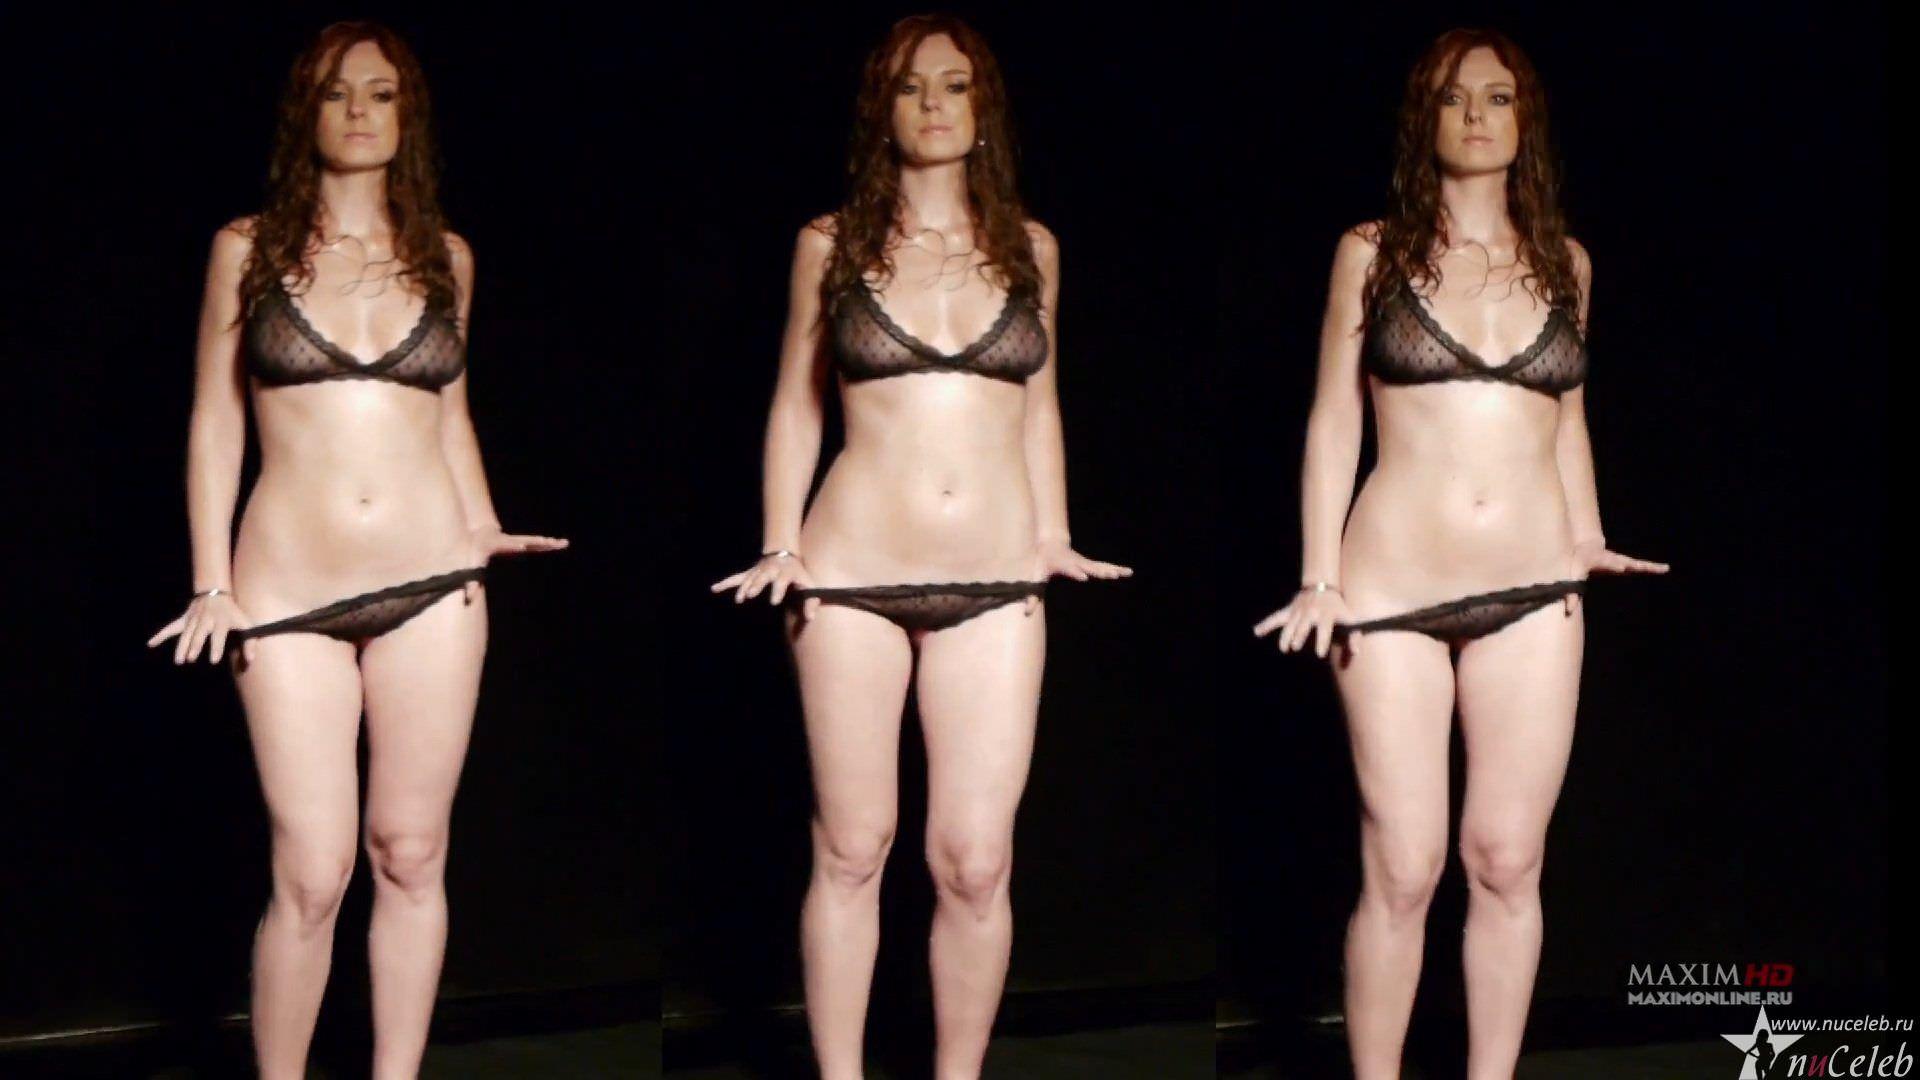 Голая певица Лена Катина фото эротика картинки